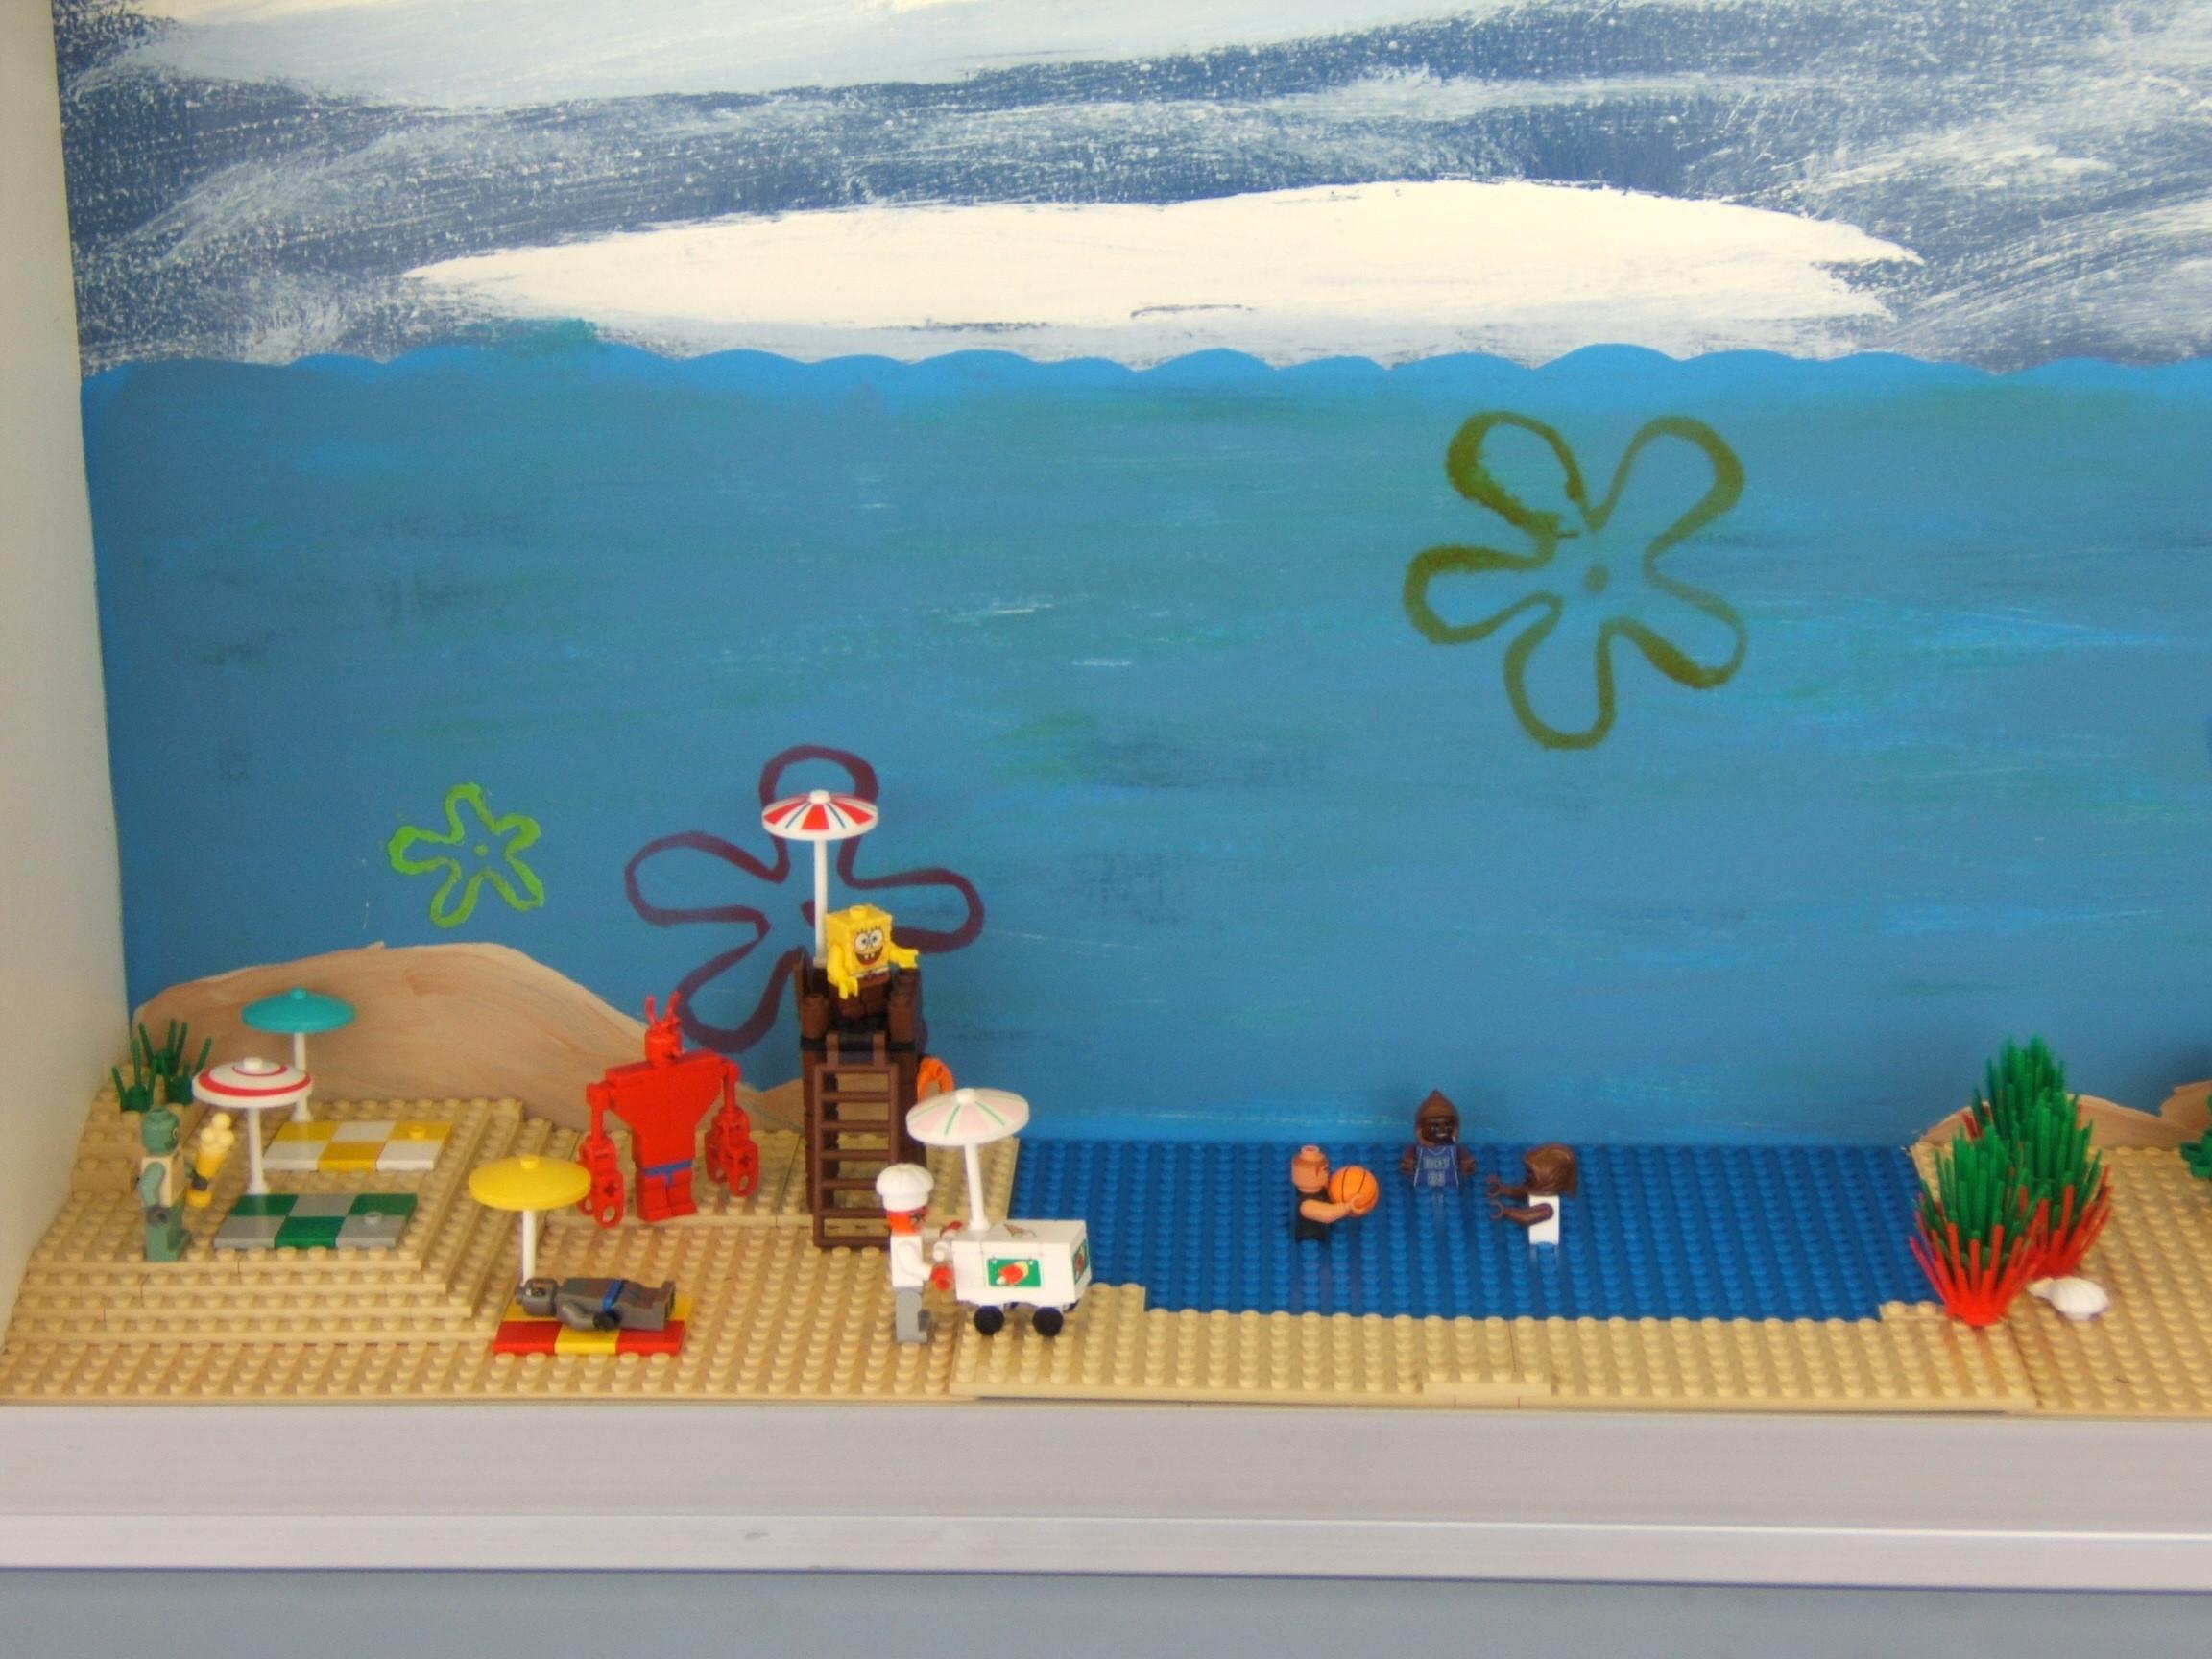 Lego SpongeBob Squarepants images Lego Sponge City HD wallpaper and  background photos